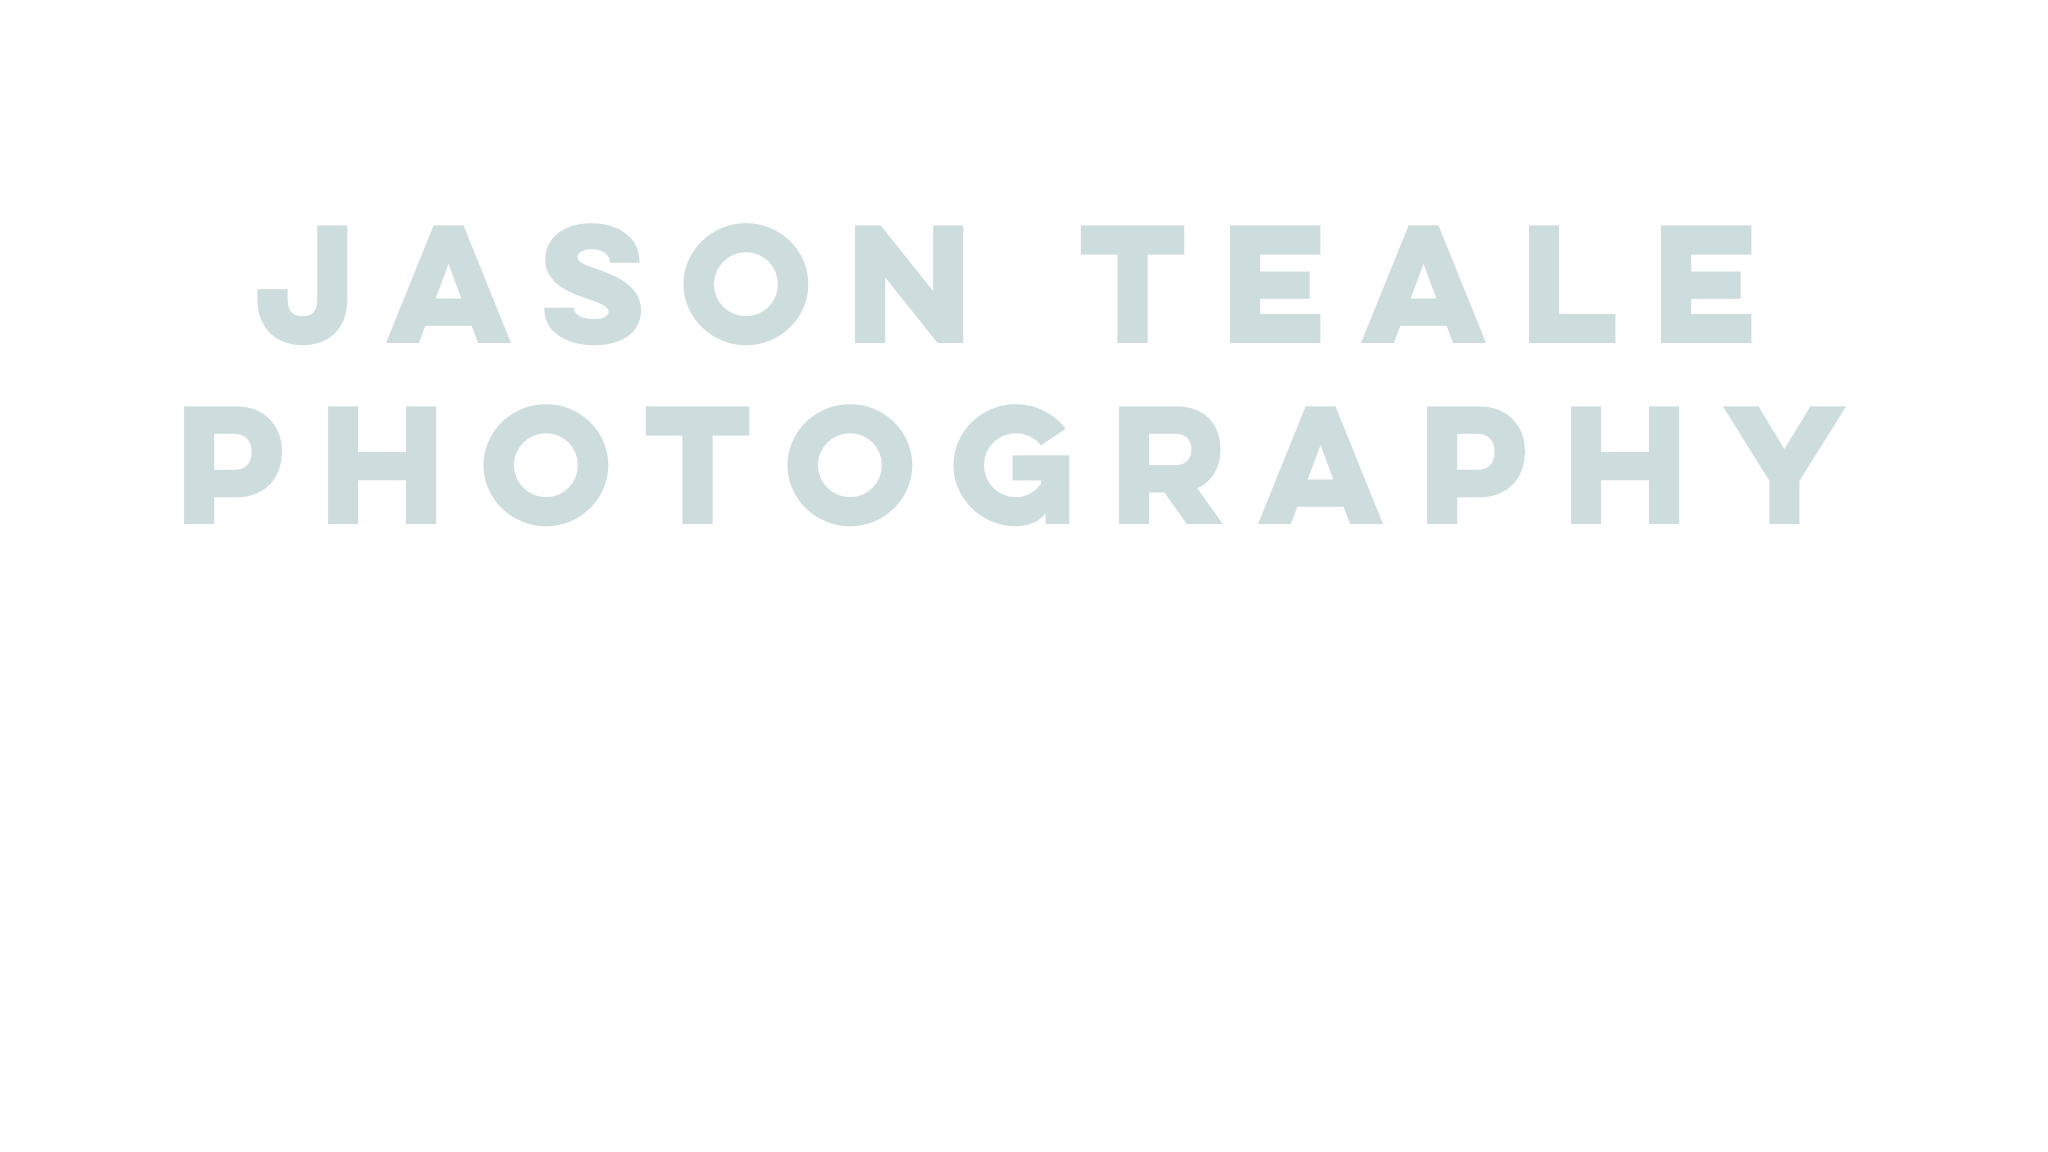 Jason Teale